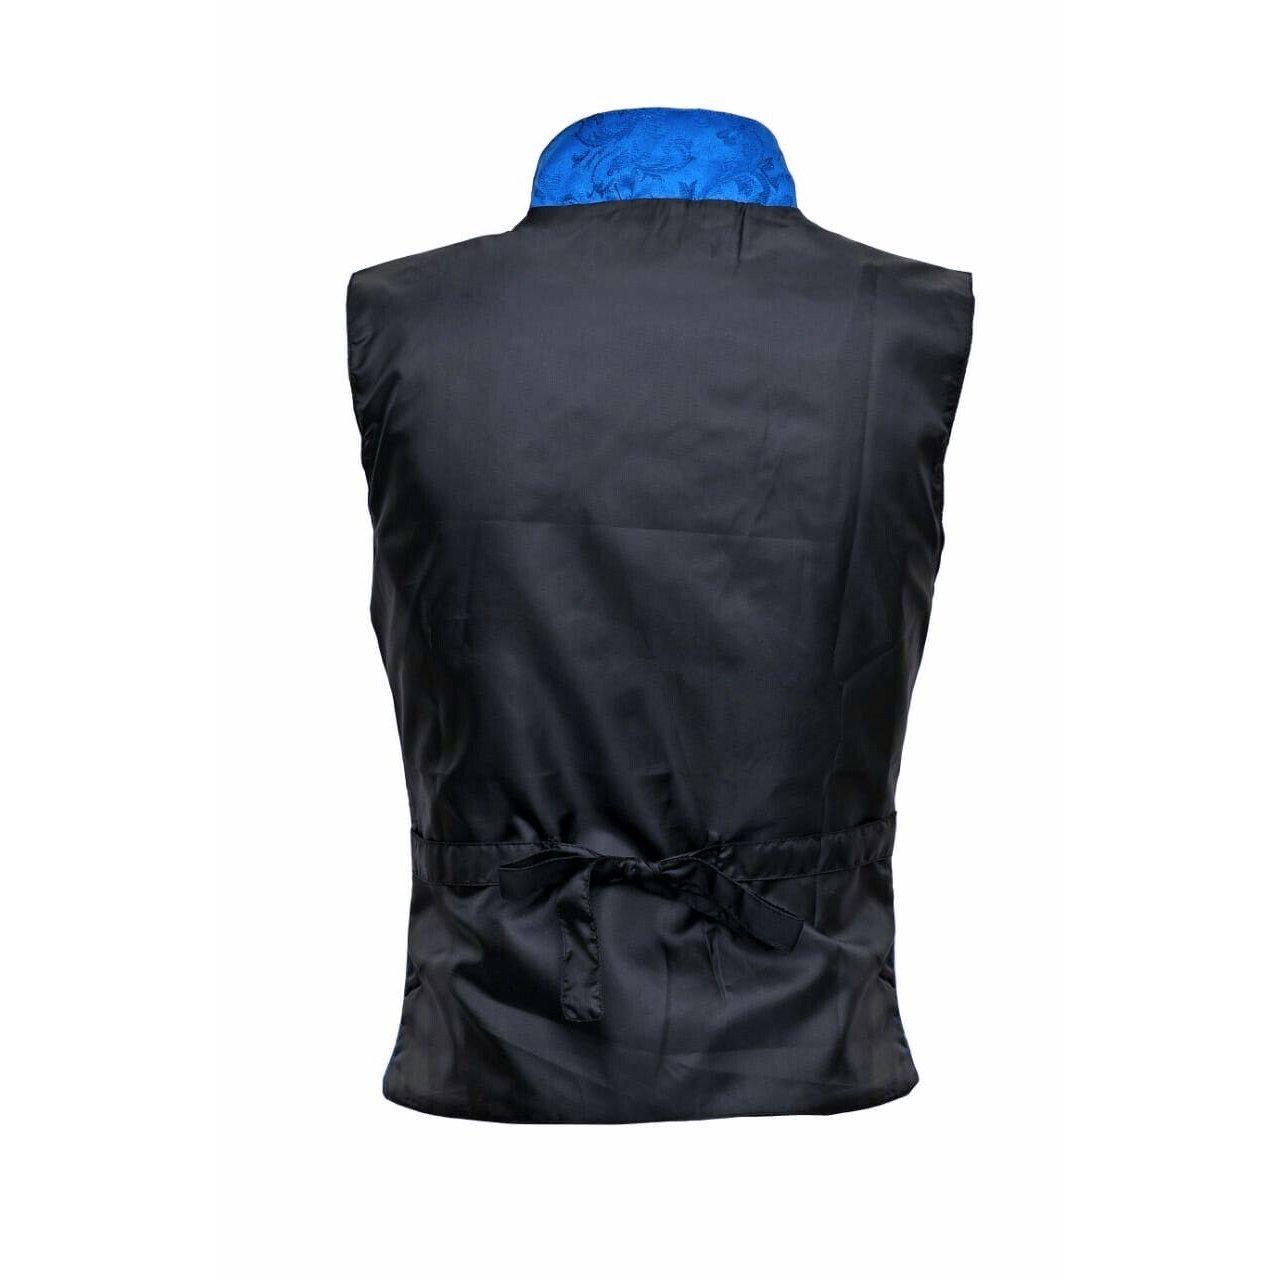 Men's Steampunk Double-breasted Waistcoat Royal Blue Vest Gothic - DARKROCK (back)